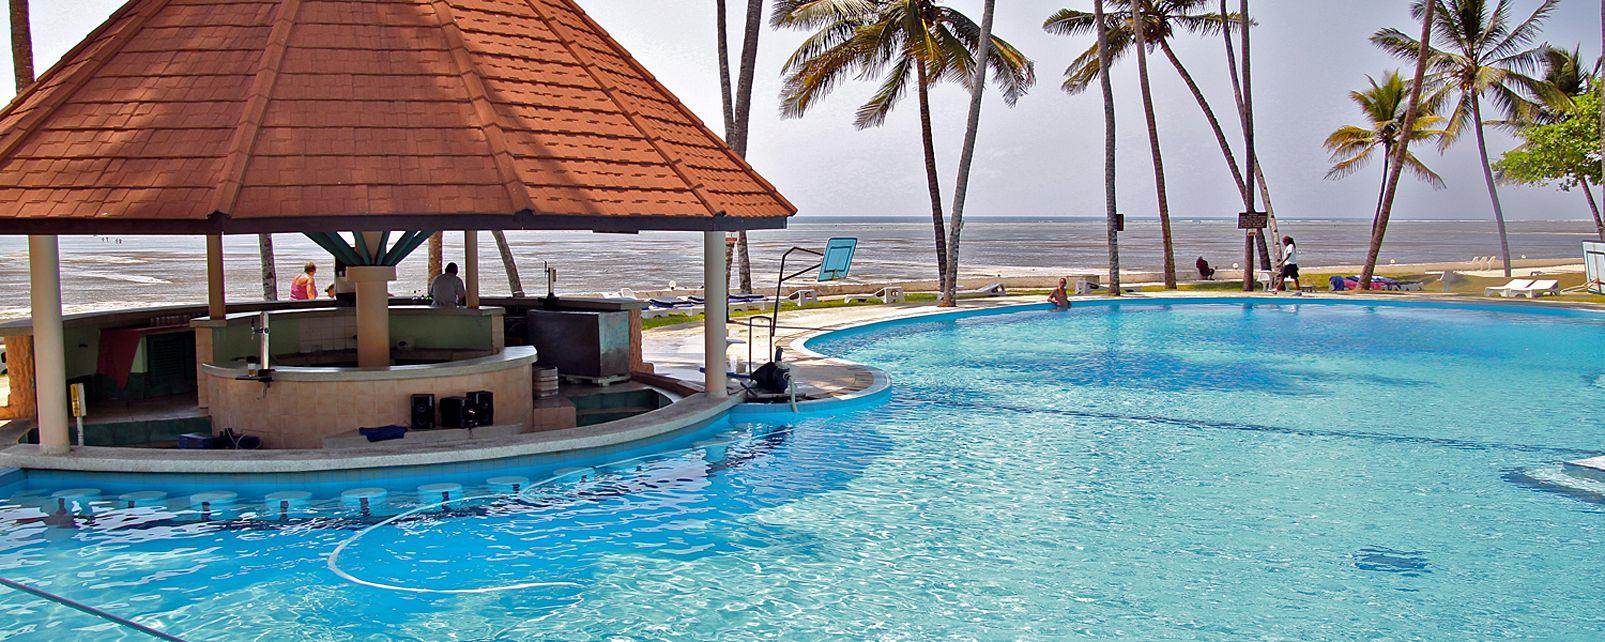 Sun And Sands Resort Myrtle Beach The Best Beaches In World